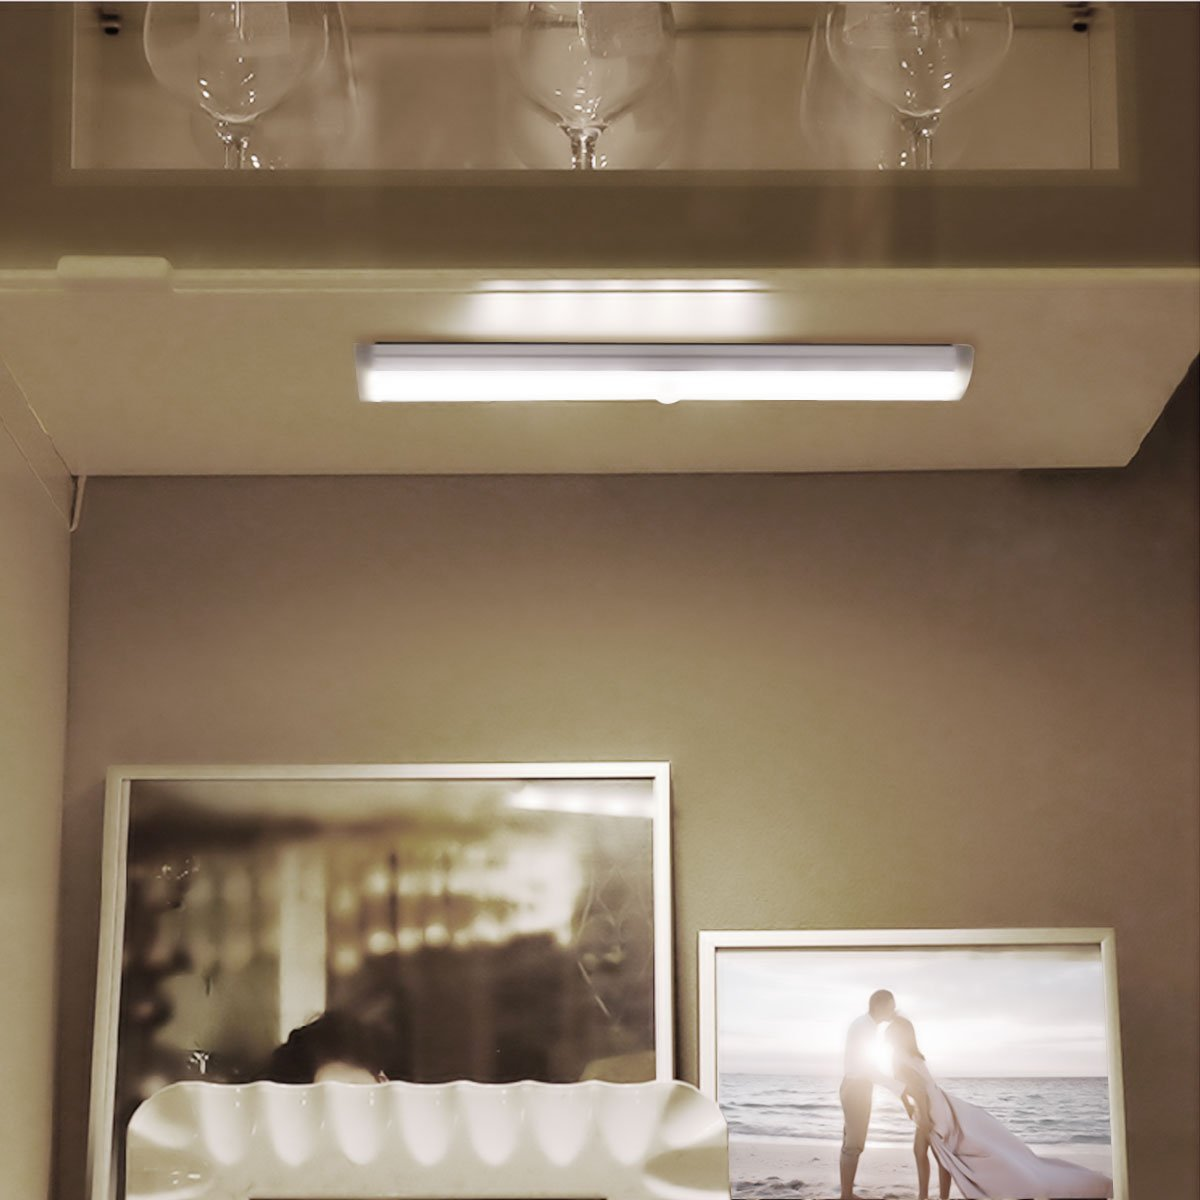 Le Pir Under Cabinet Lighting Wireless Motion Sensor Light